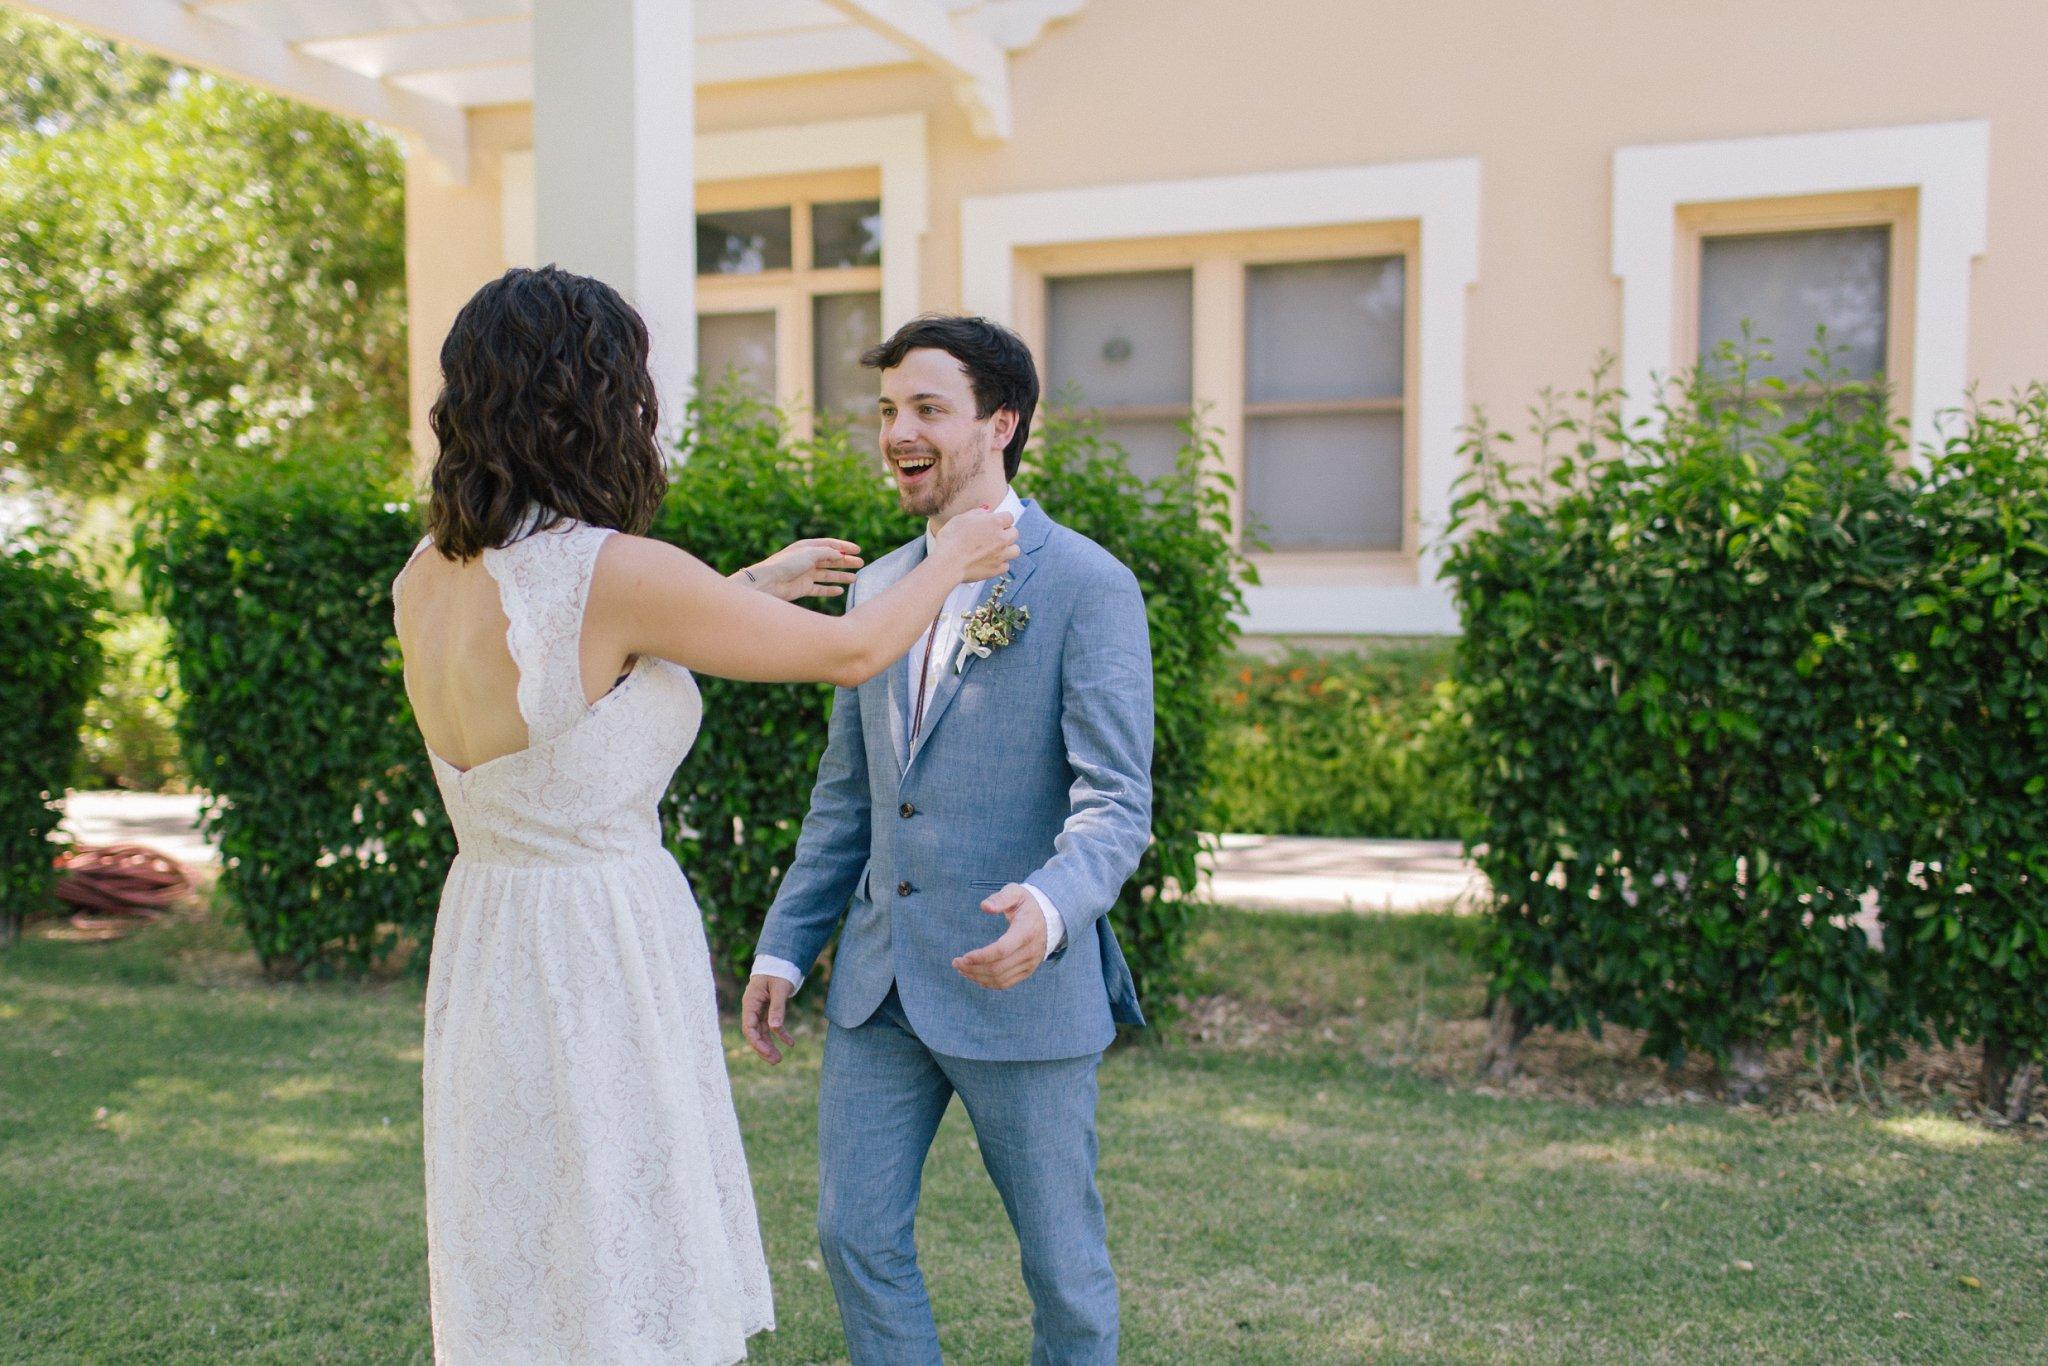 Phoenix summer wedding short wedding dress first look at Norton House